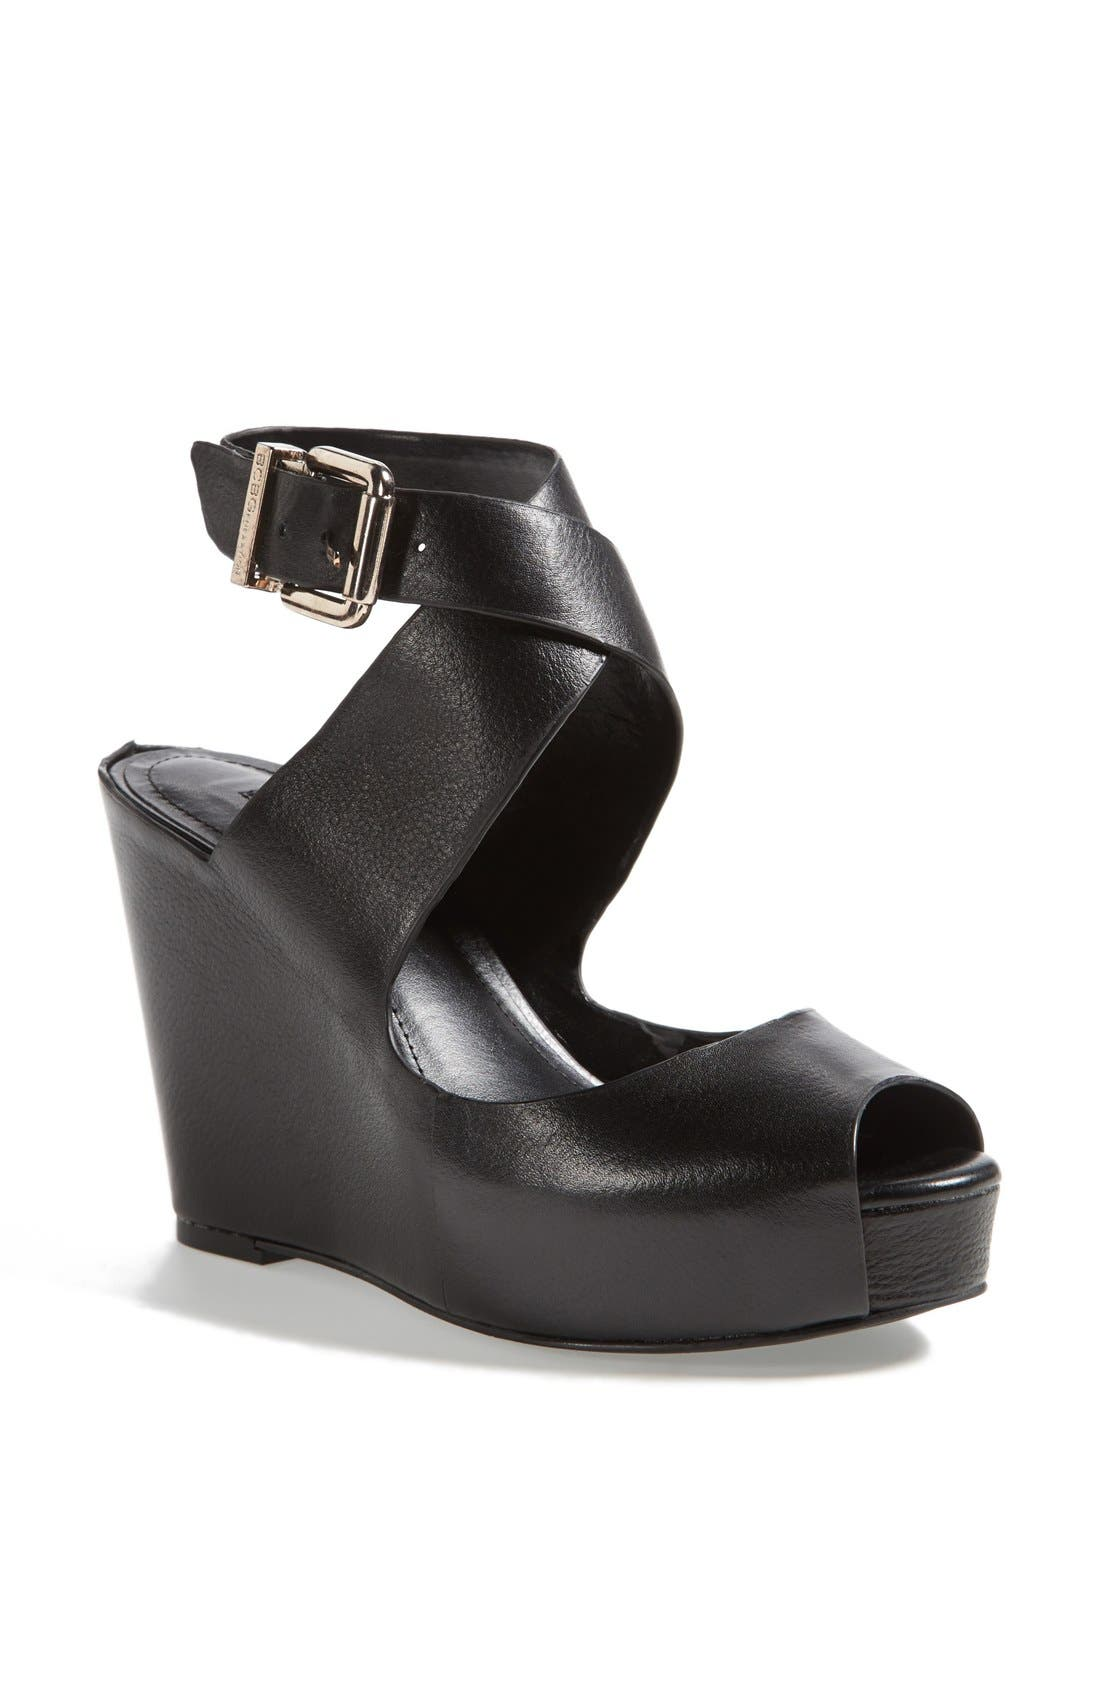 Main Image - BCBGeneration 'Tevos' Sandal